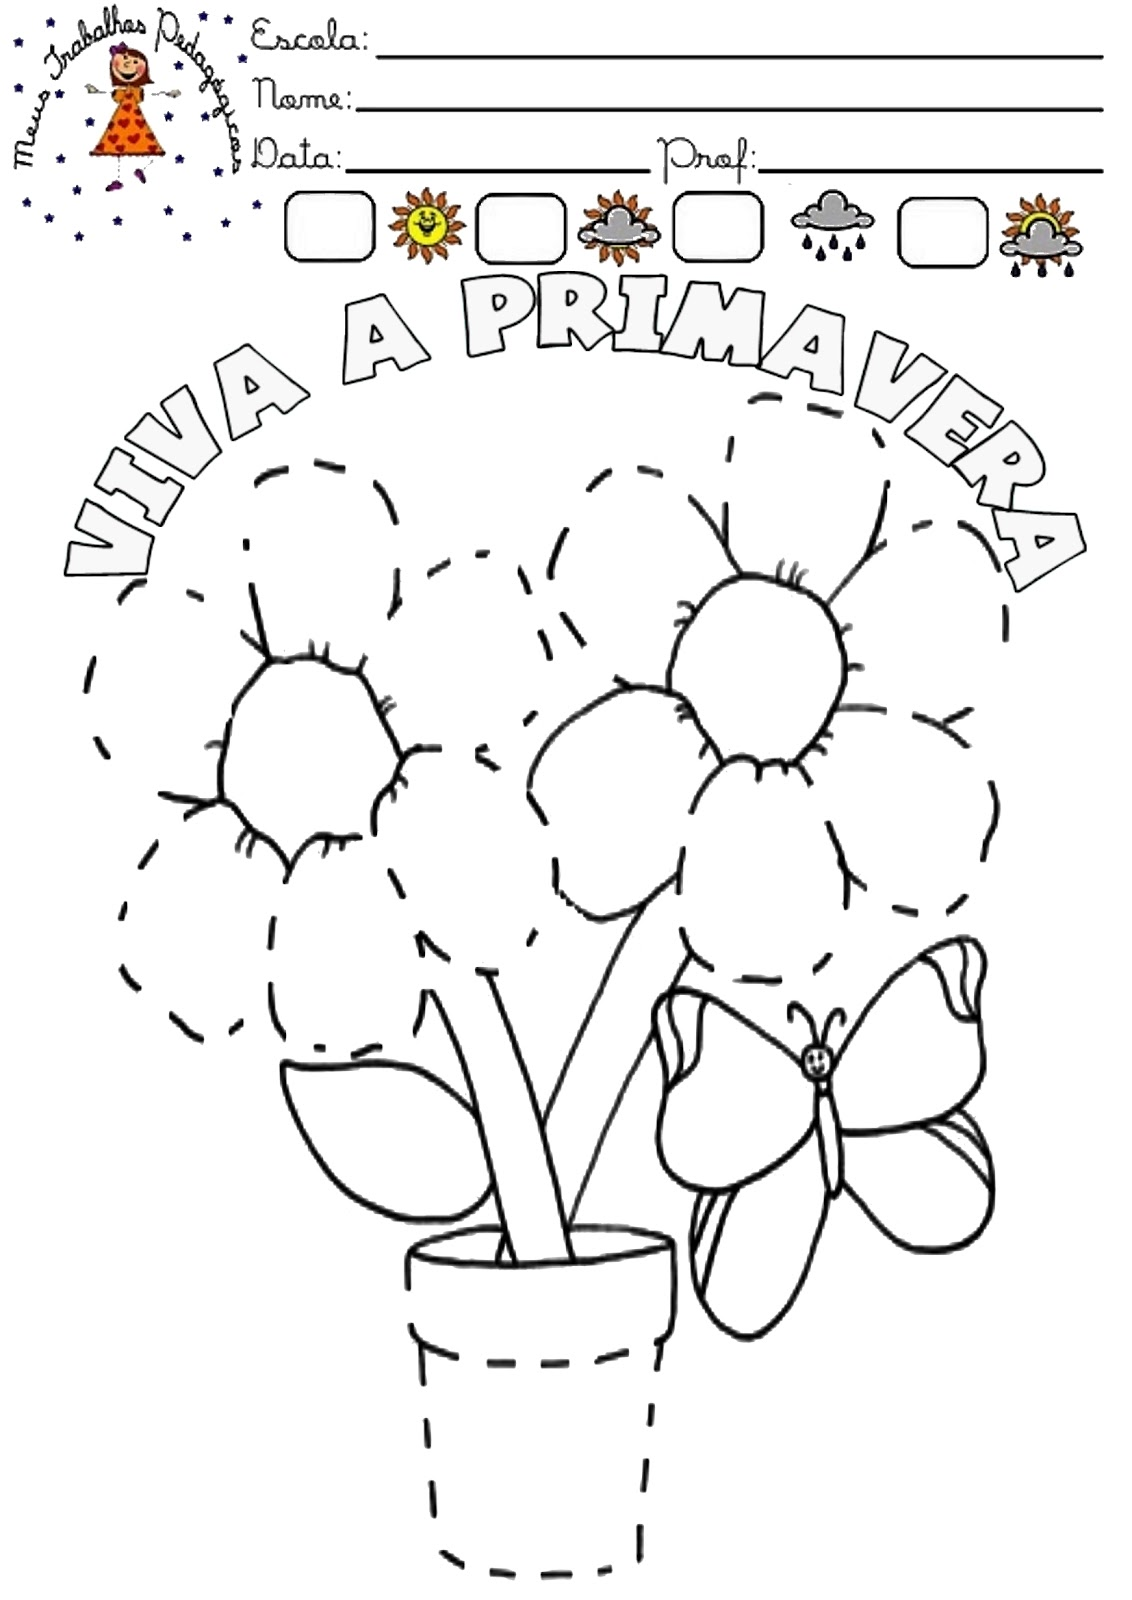 Populares Meus Trabalhos Pedagógicos ®: Primavera - Flores para colorir XU05